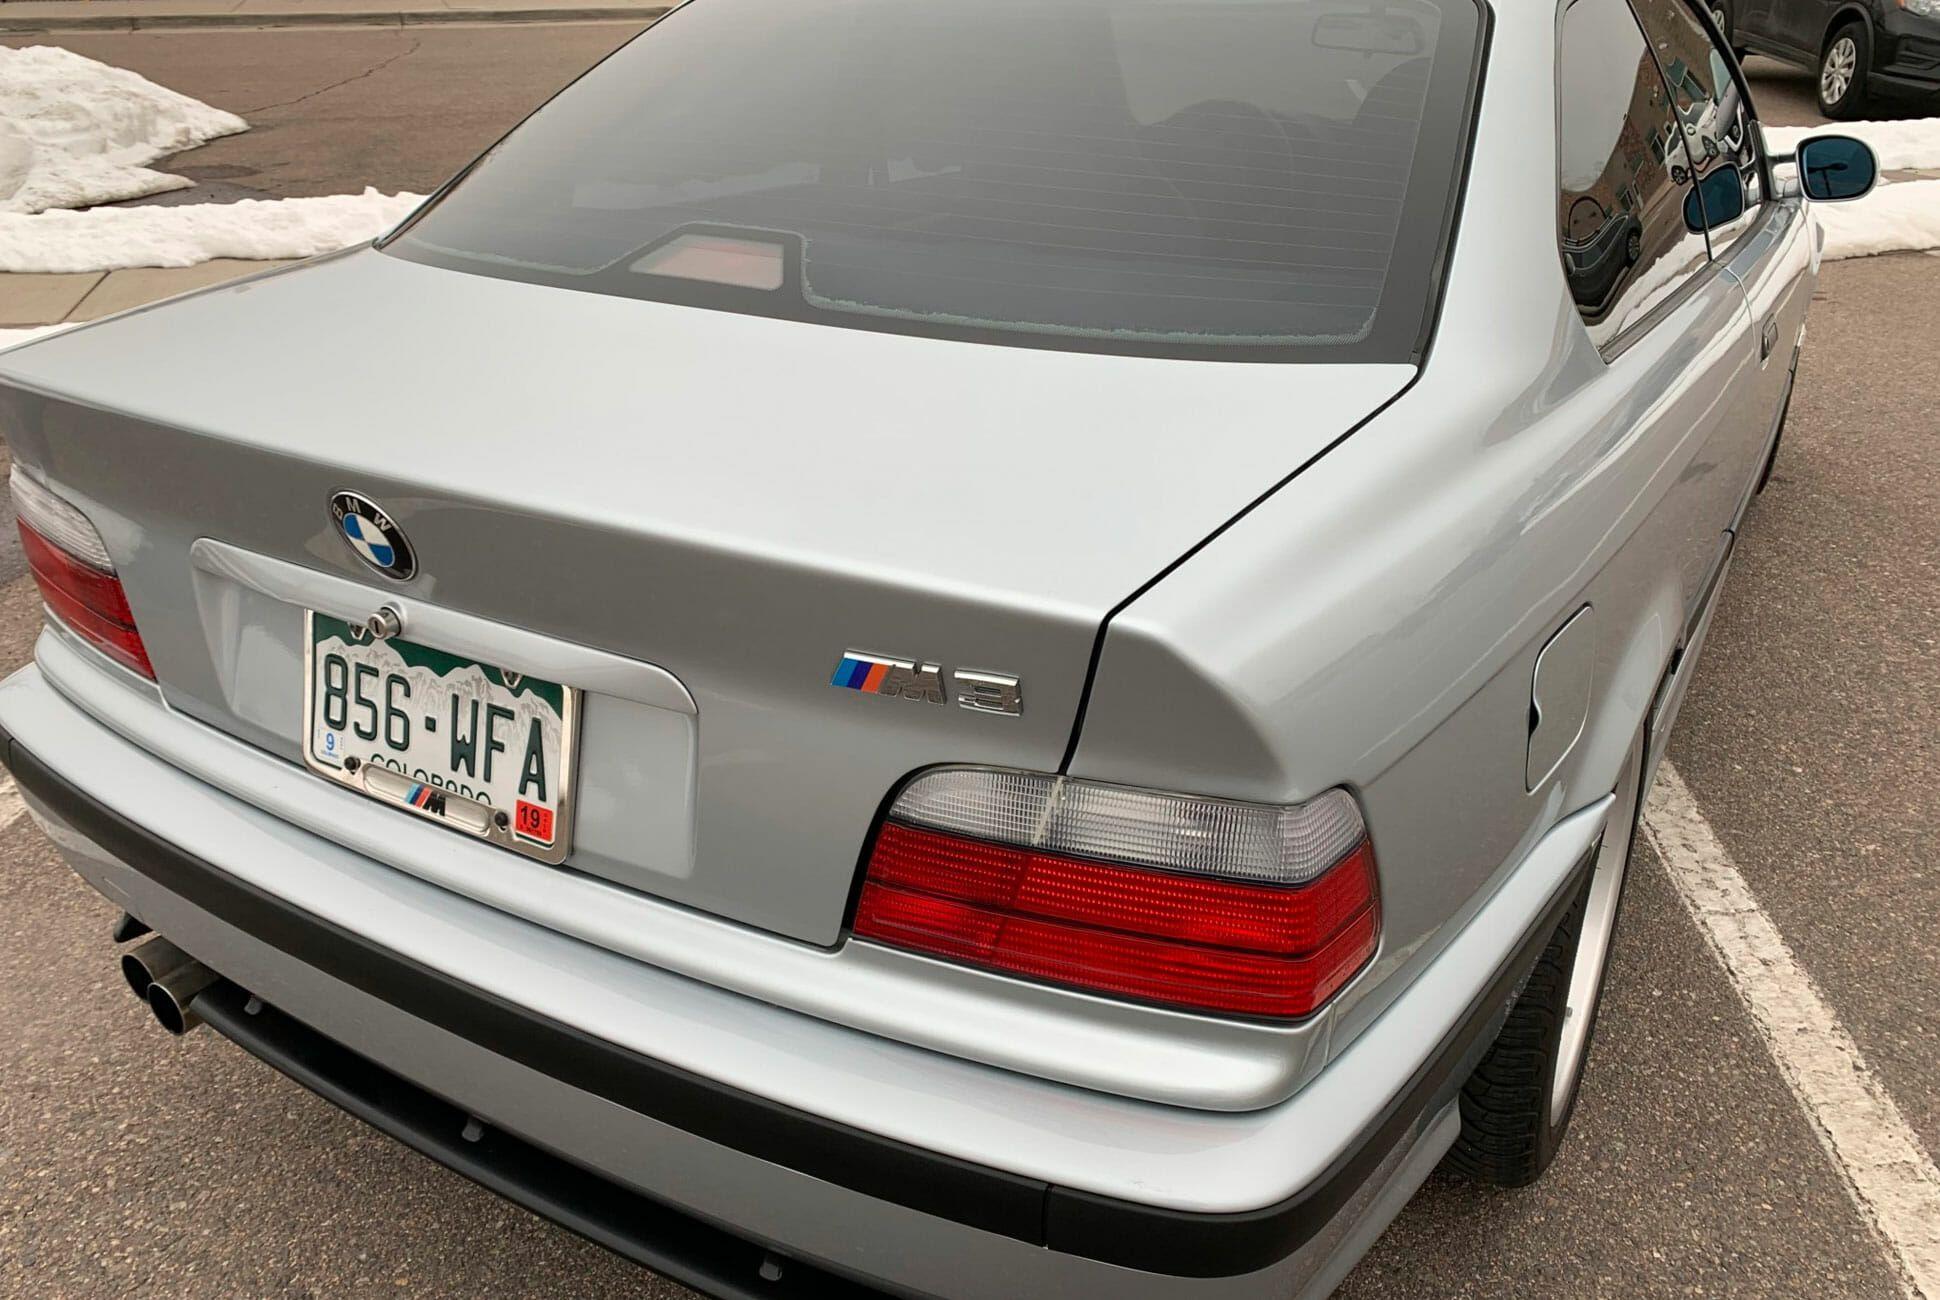 1996-BMW-M3-Coupe-5-Speed-gear-patrol-slide-03